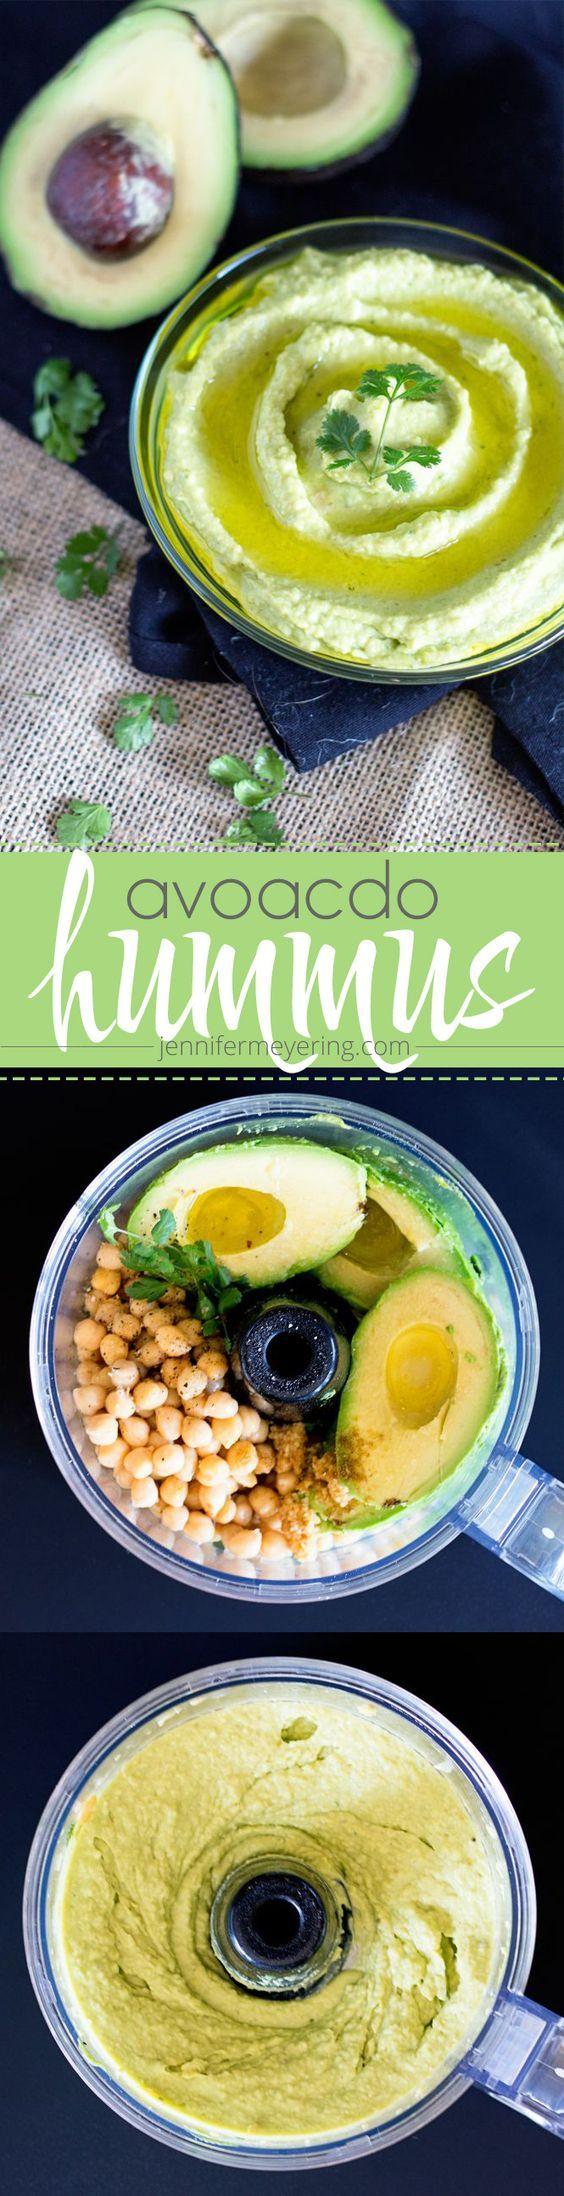 LIVER CLEANSING DIET - Avocado Hummus |